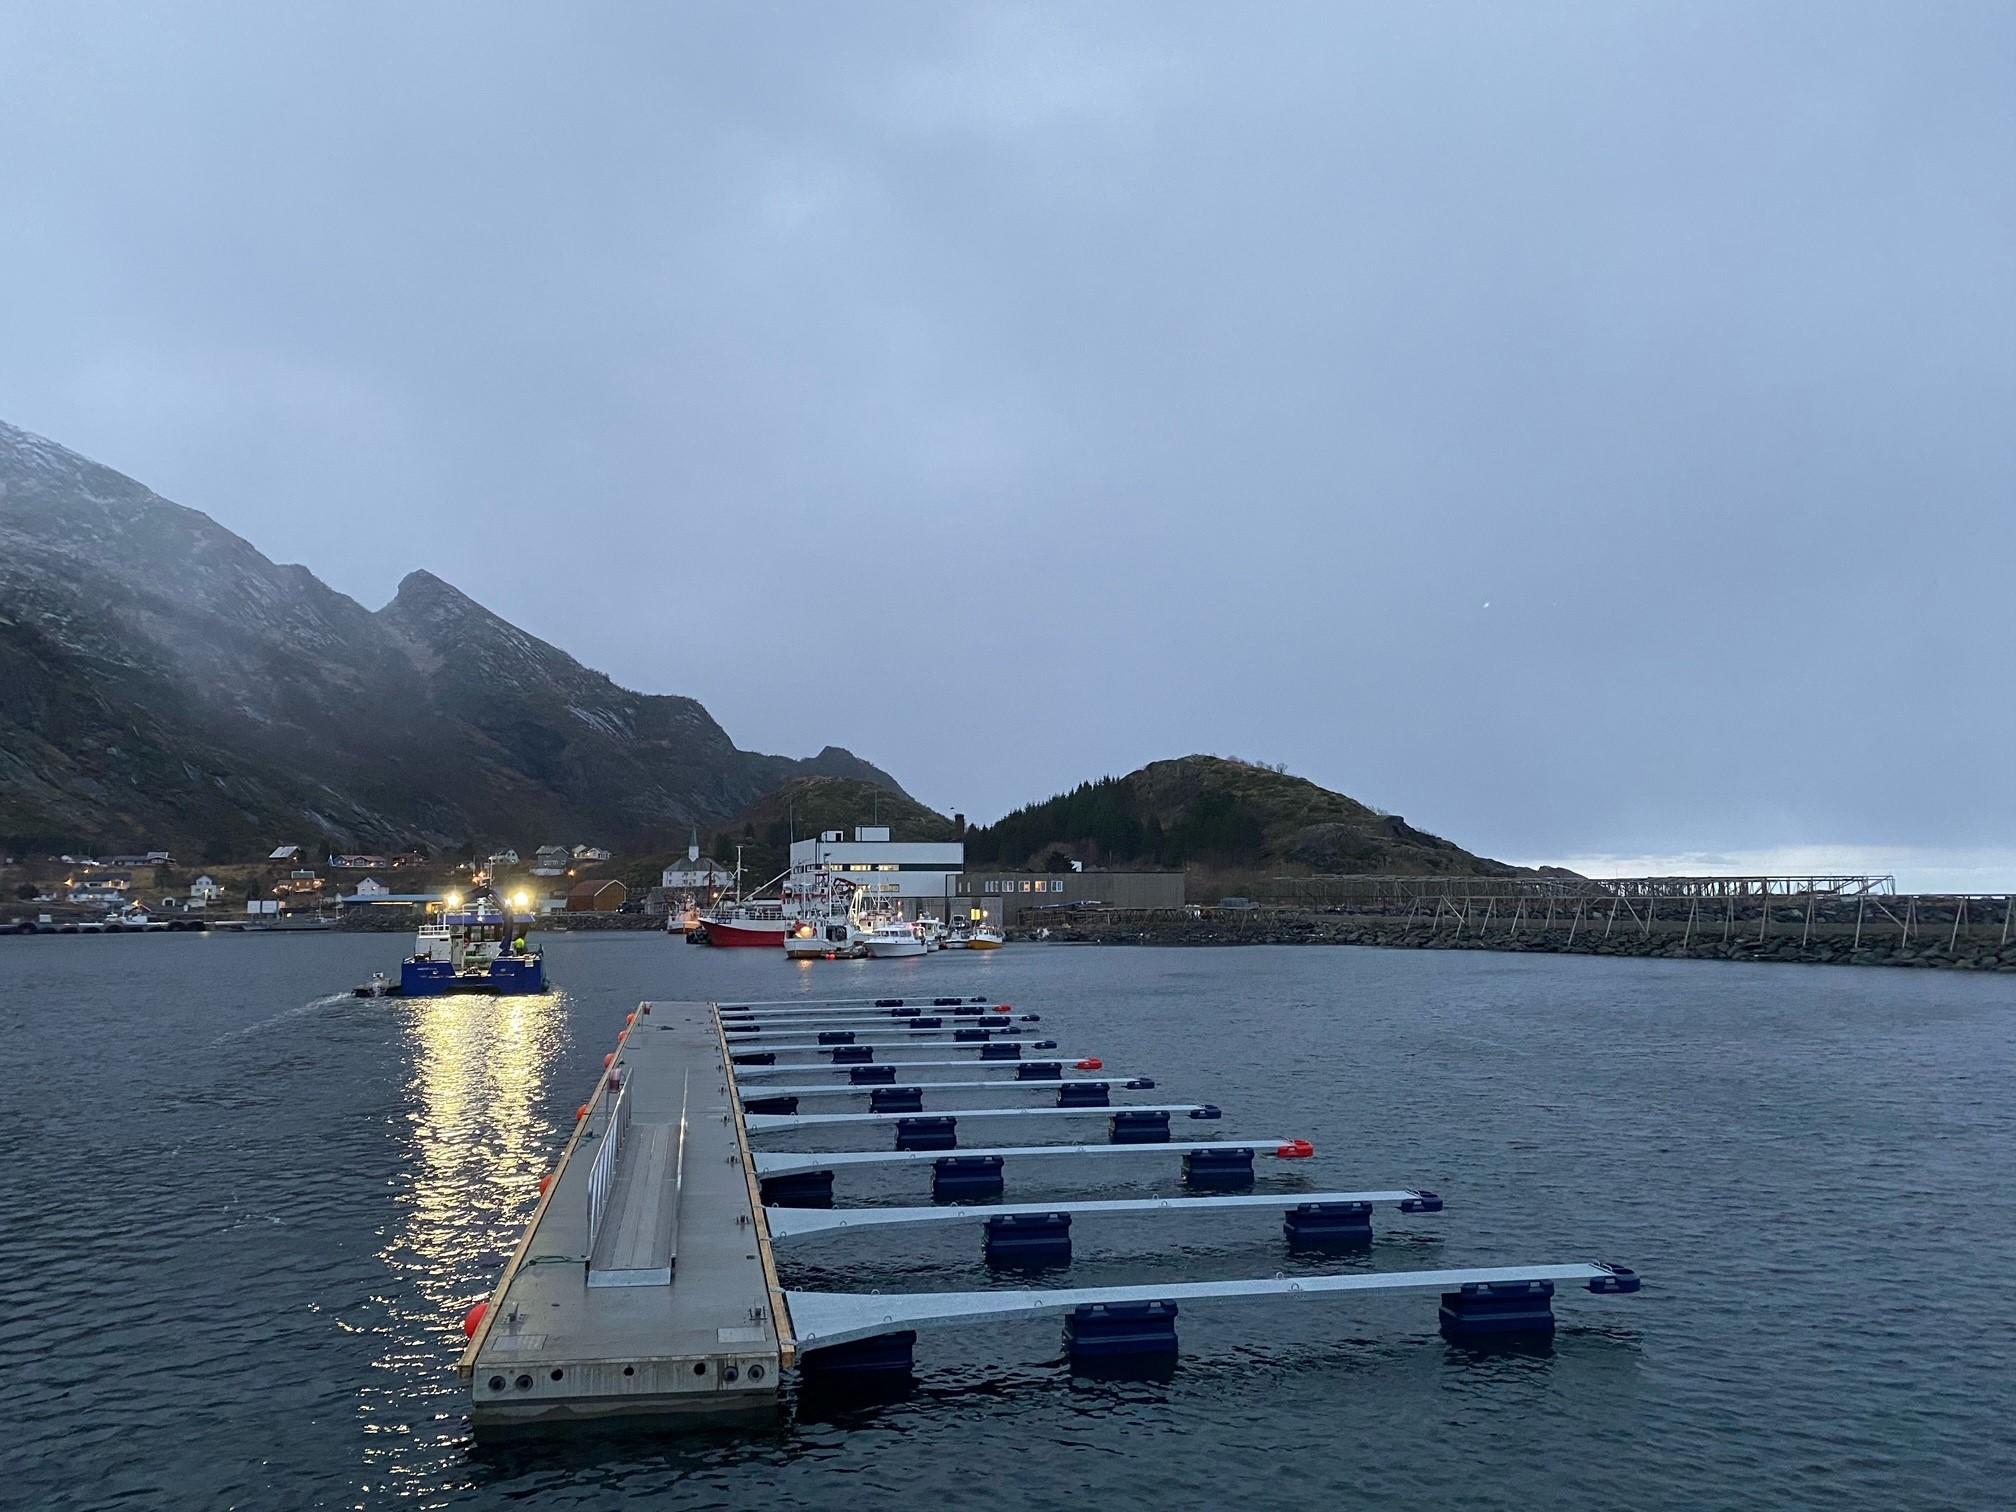 https://marinasolutions.no/uploads/Moskenesvågen-Fiskebåtlag_betongbrygger-og-utriggere-4.jpg